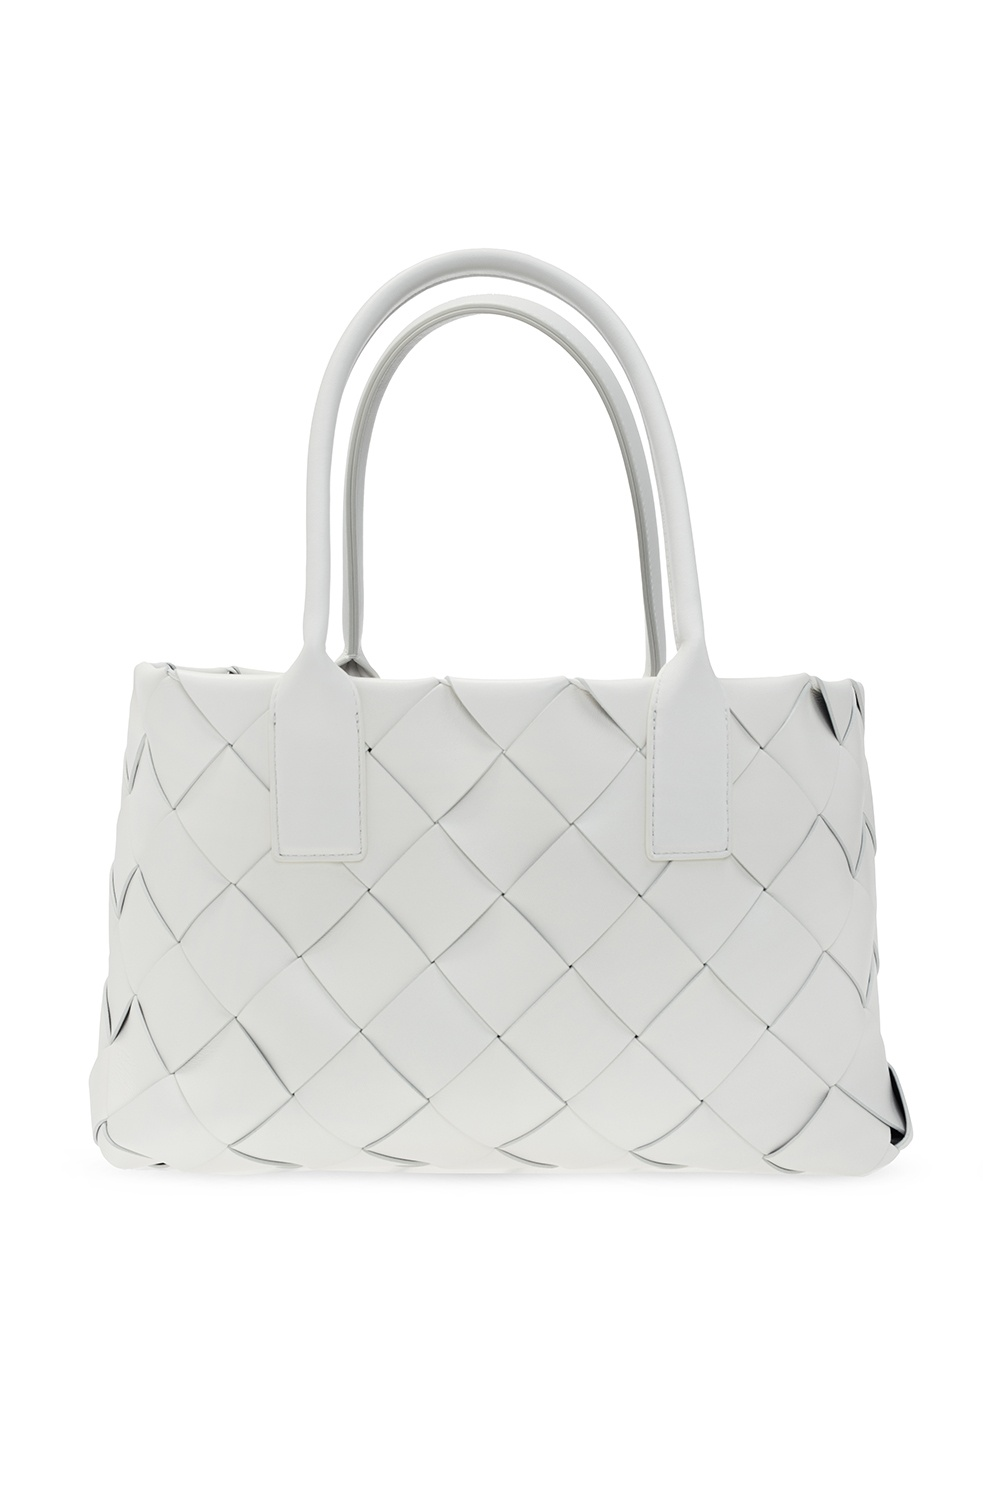 Bottega Veneta 'Cabat tote' hand bag